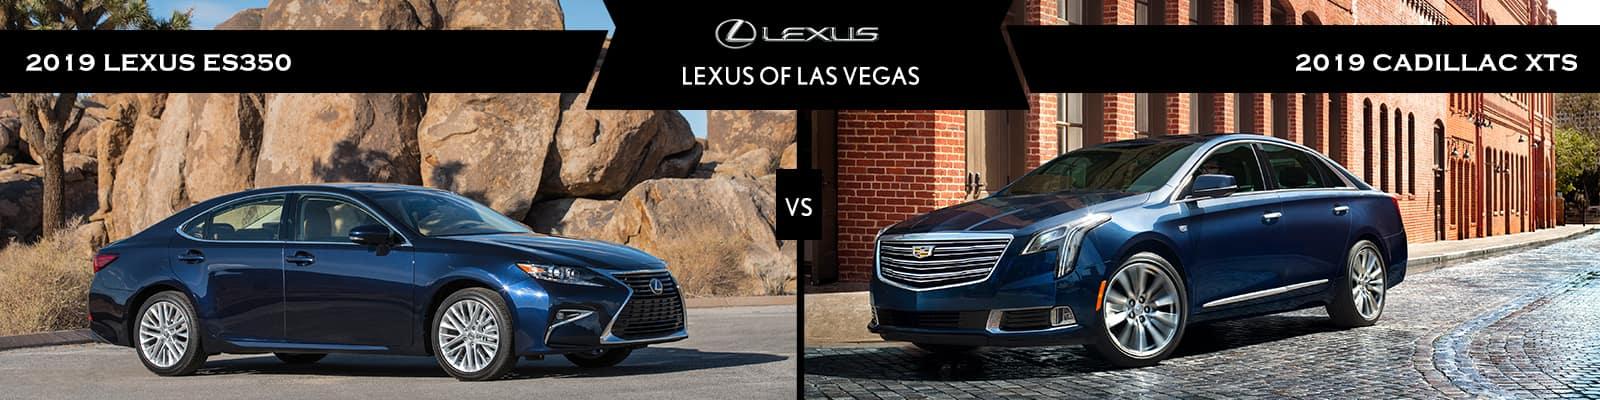 Lexus ES vs Cadillac XTS: Pros and Cons l Lexus of Las Vegas